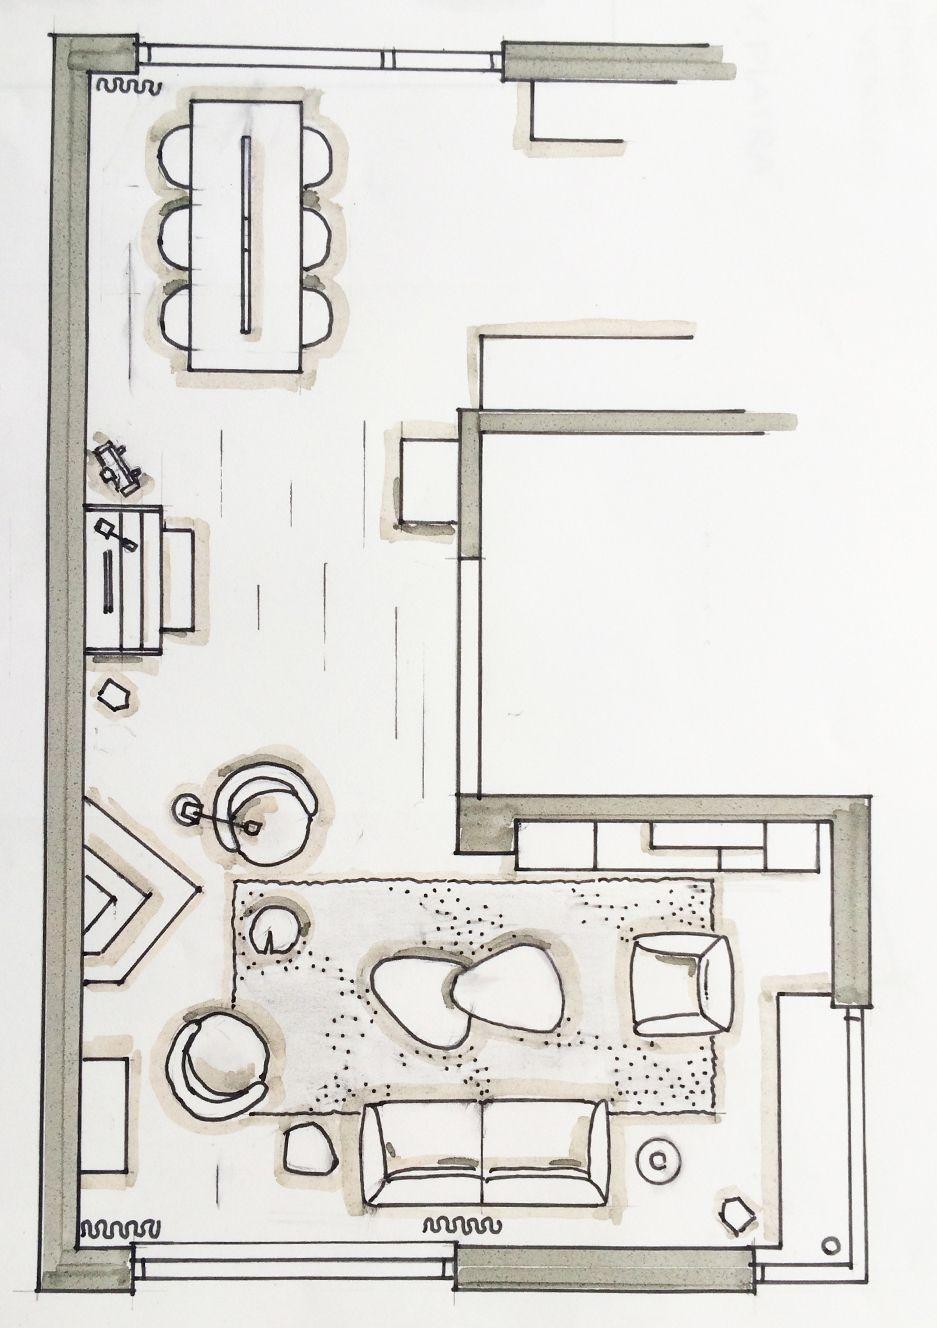 19 Ideeen Over Interieur Tekenen Interieurschets Interieur Woonkamer Tekenen